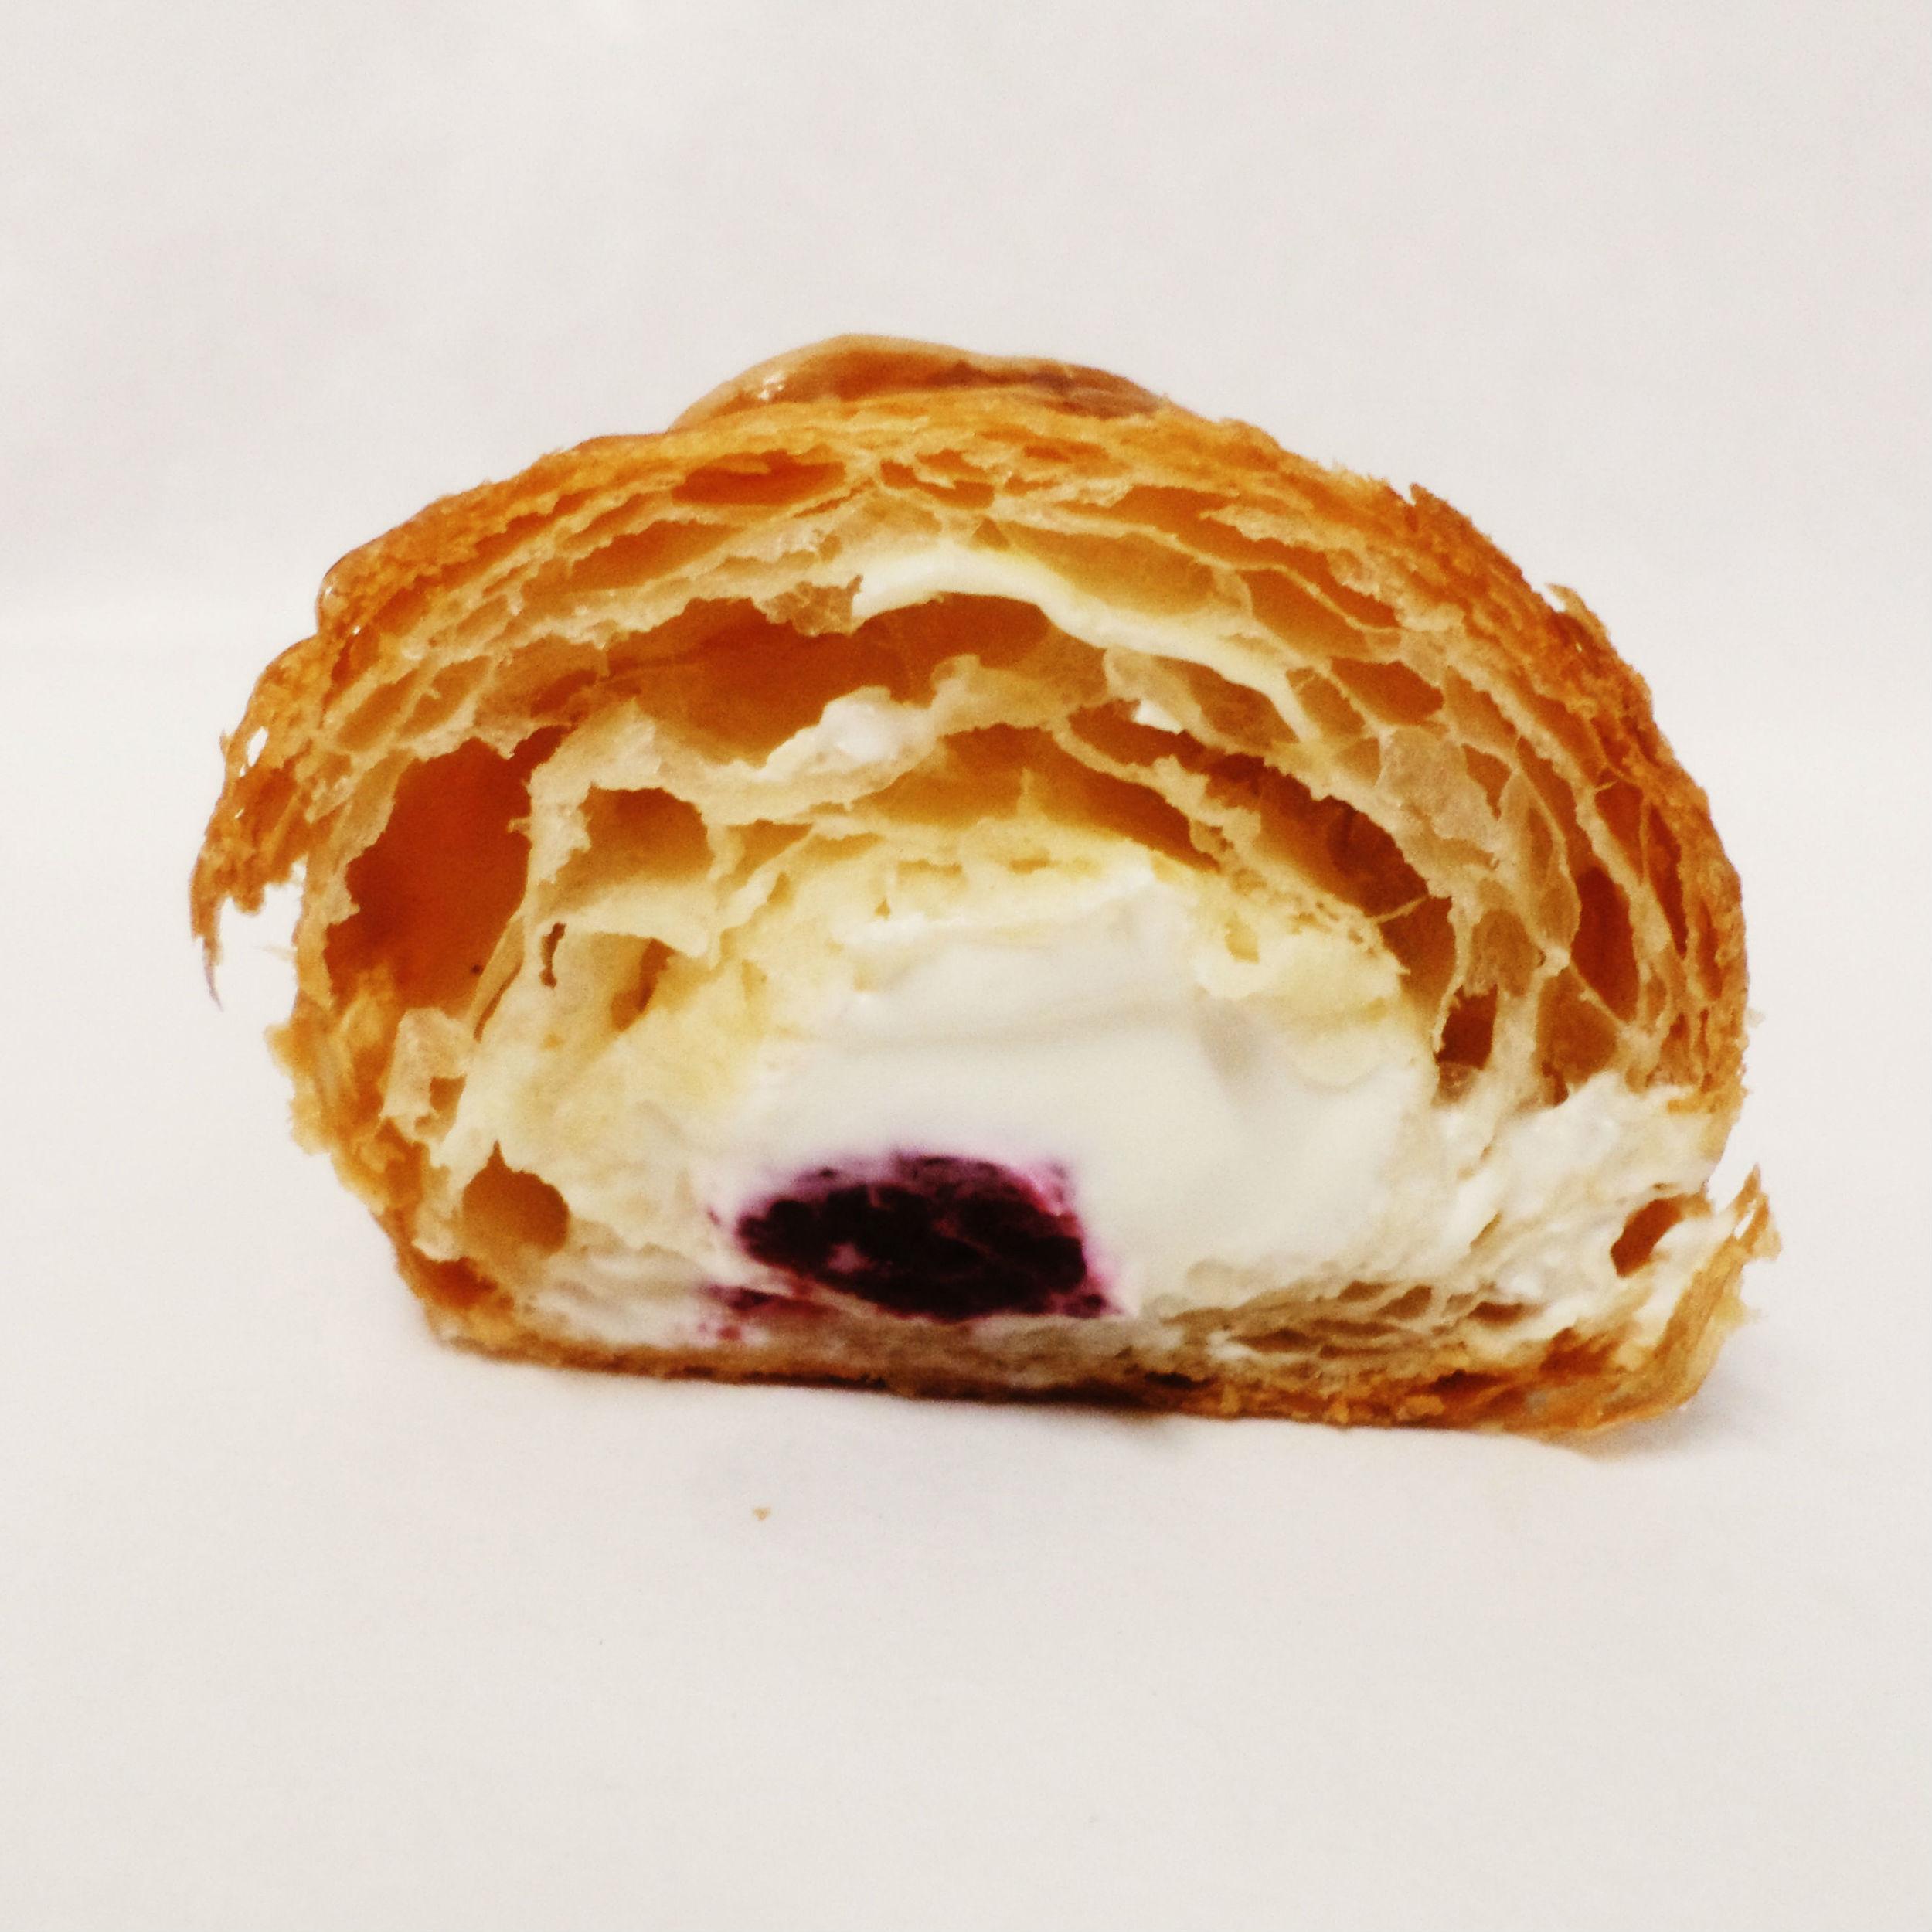 Relleno del croissant